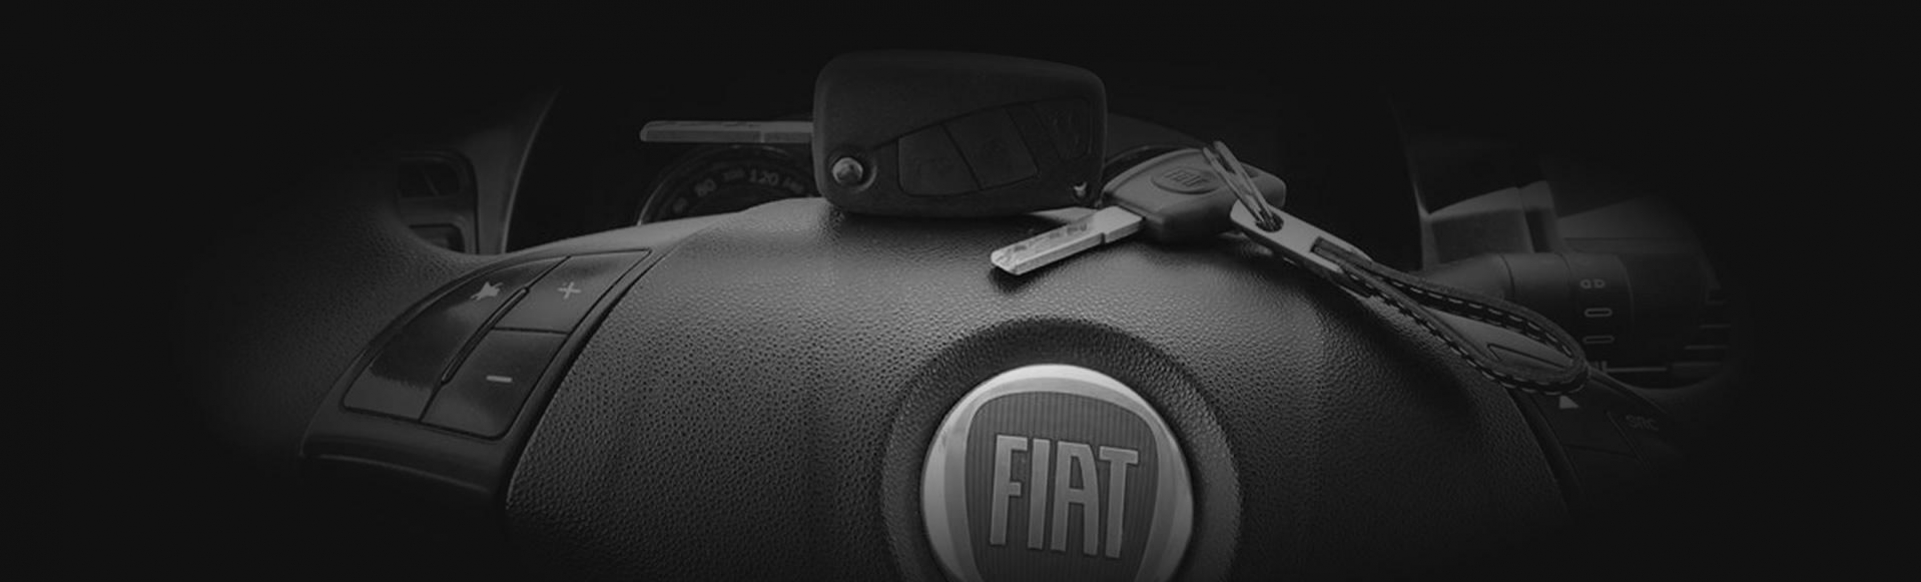 Fiat Fiorino anahtar yedekleme